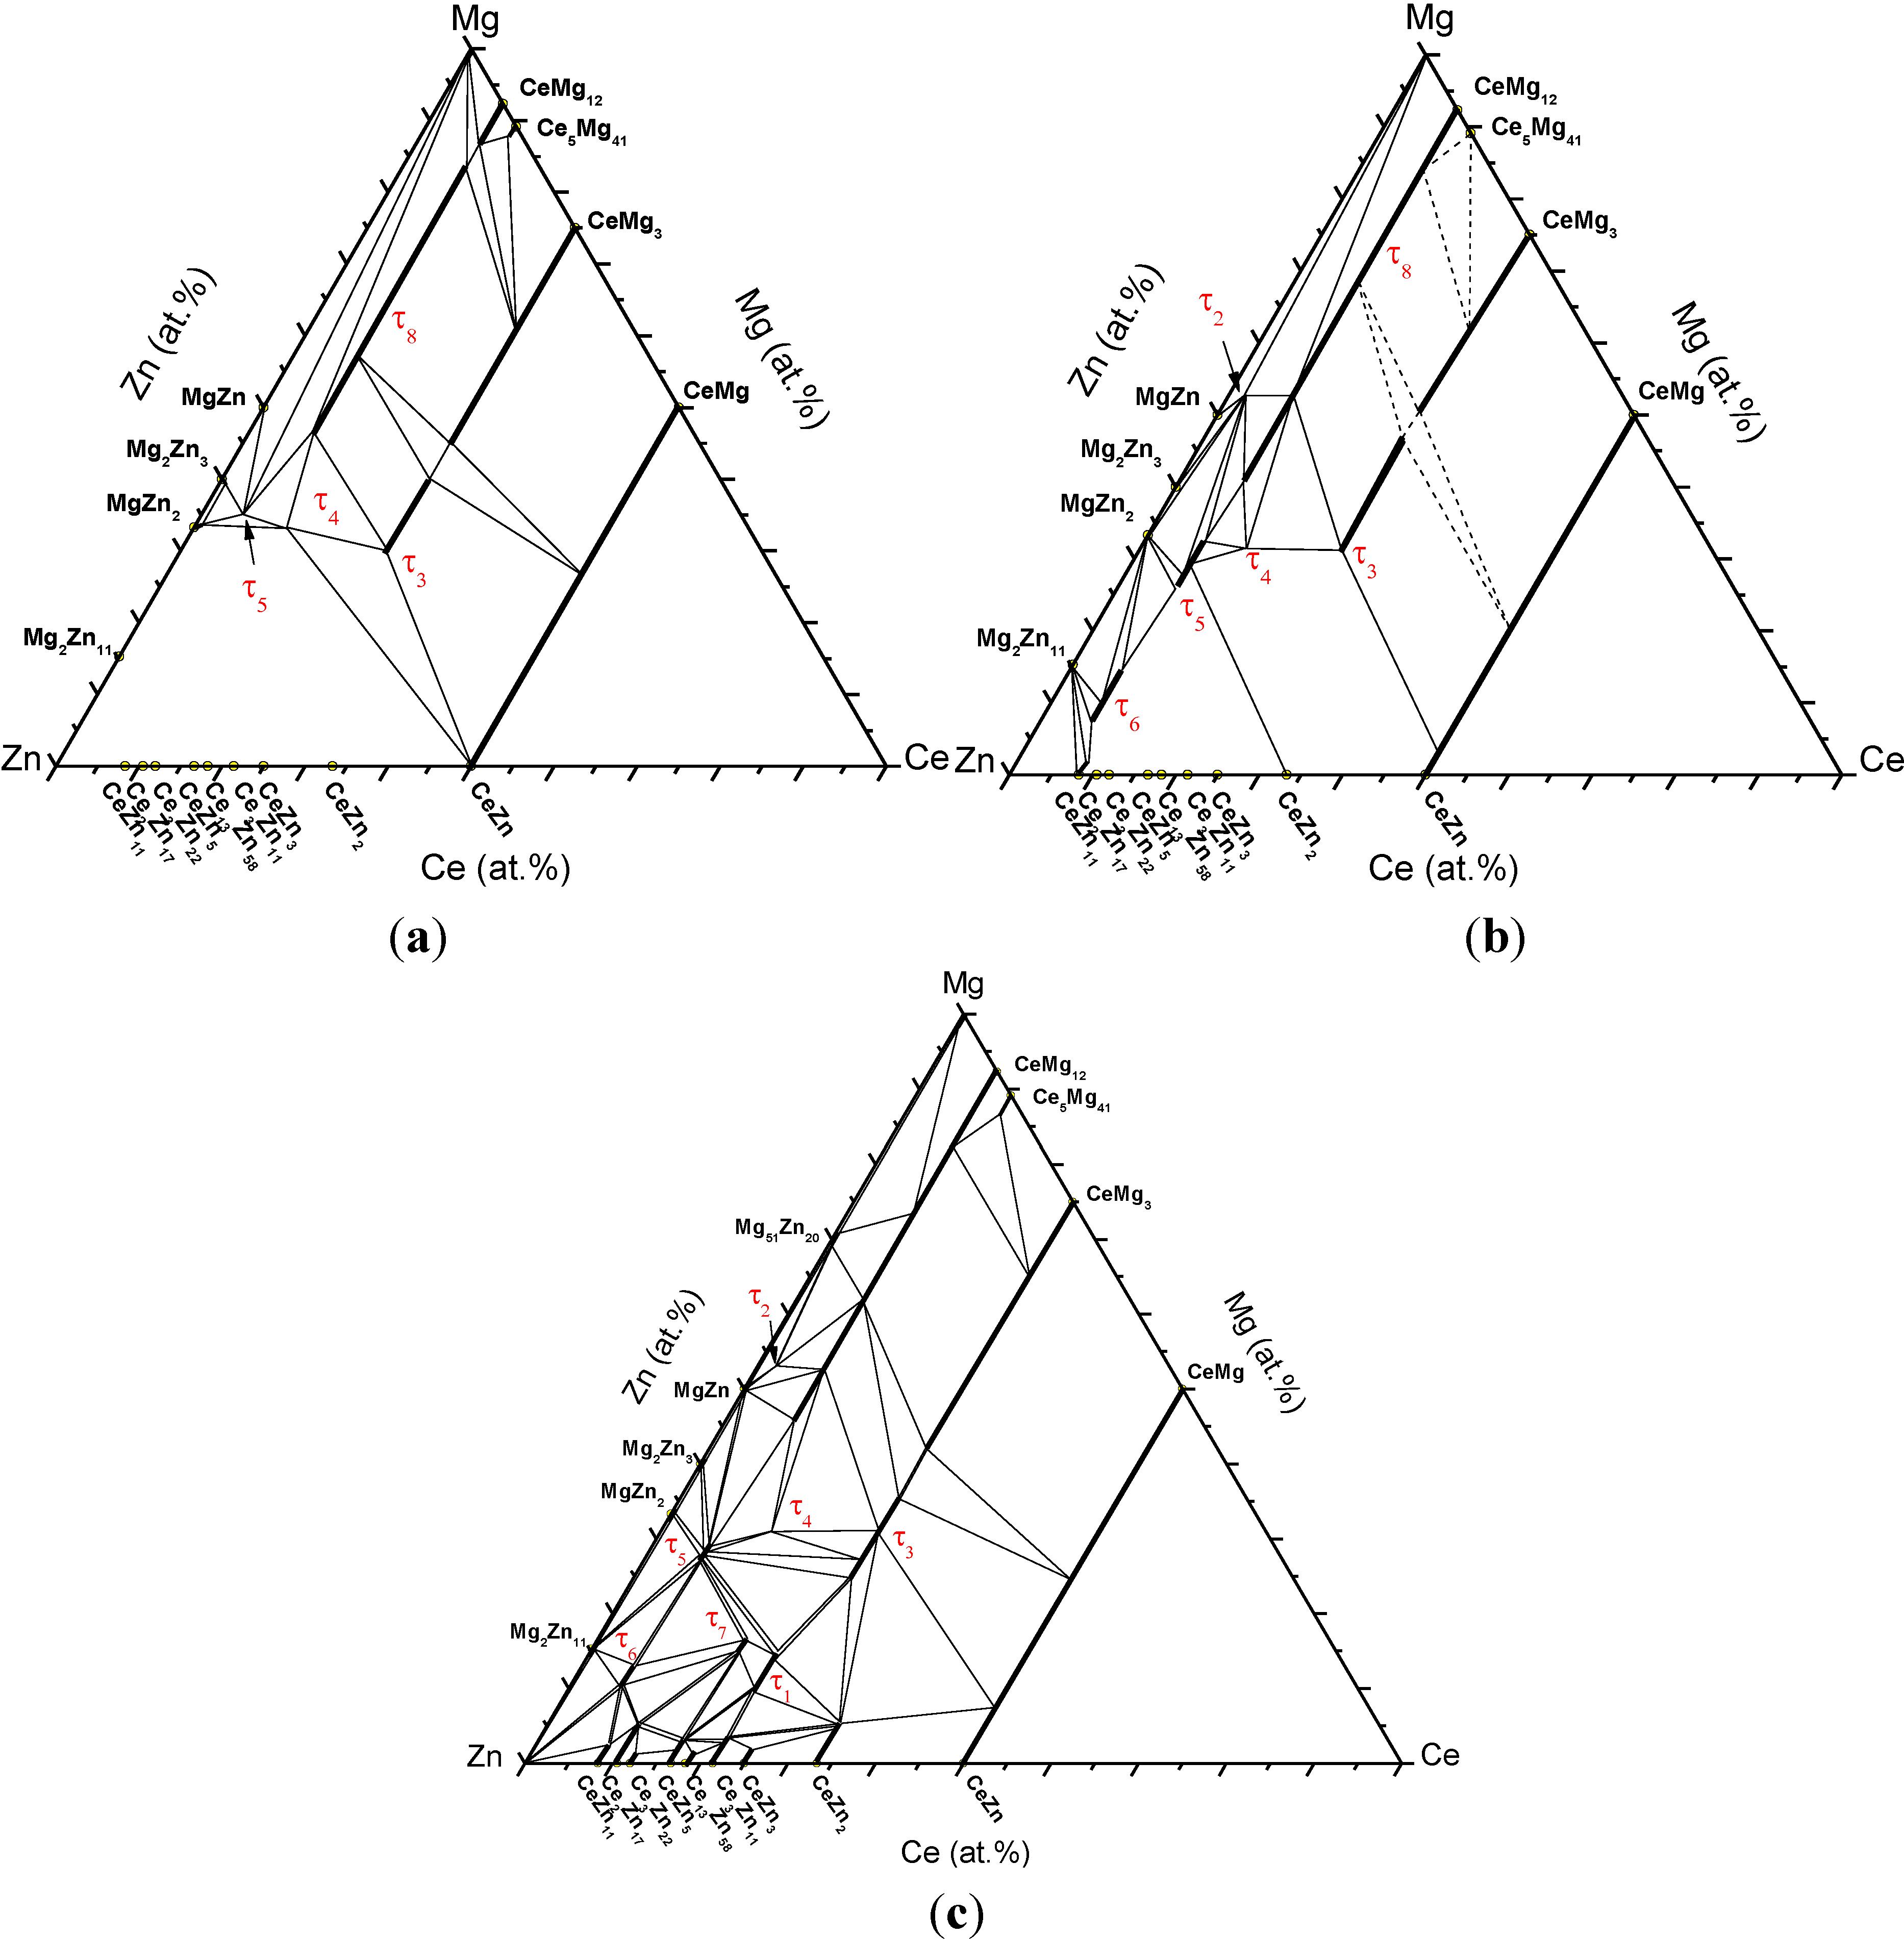 Wiring Diagram 1978 Mgb